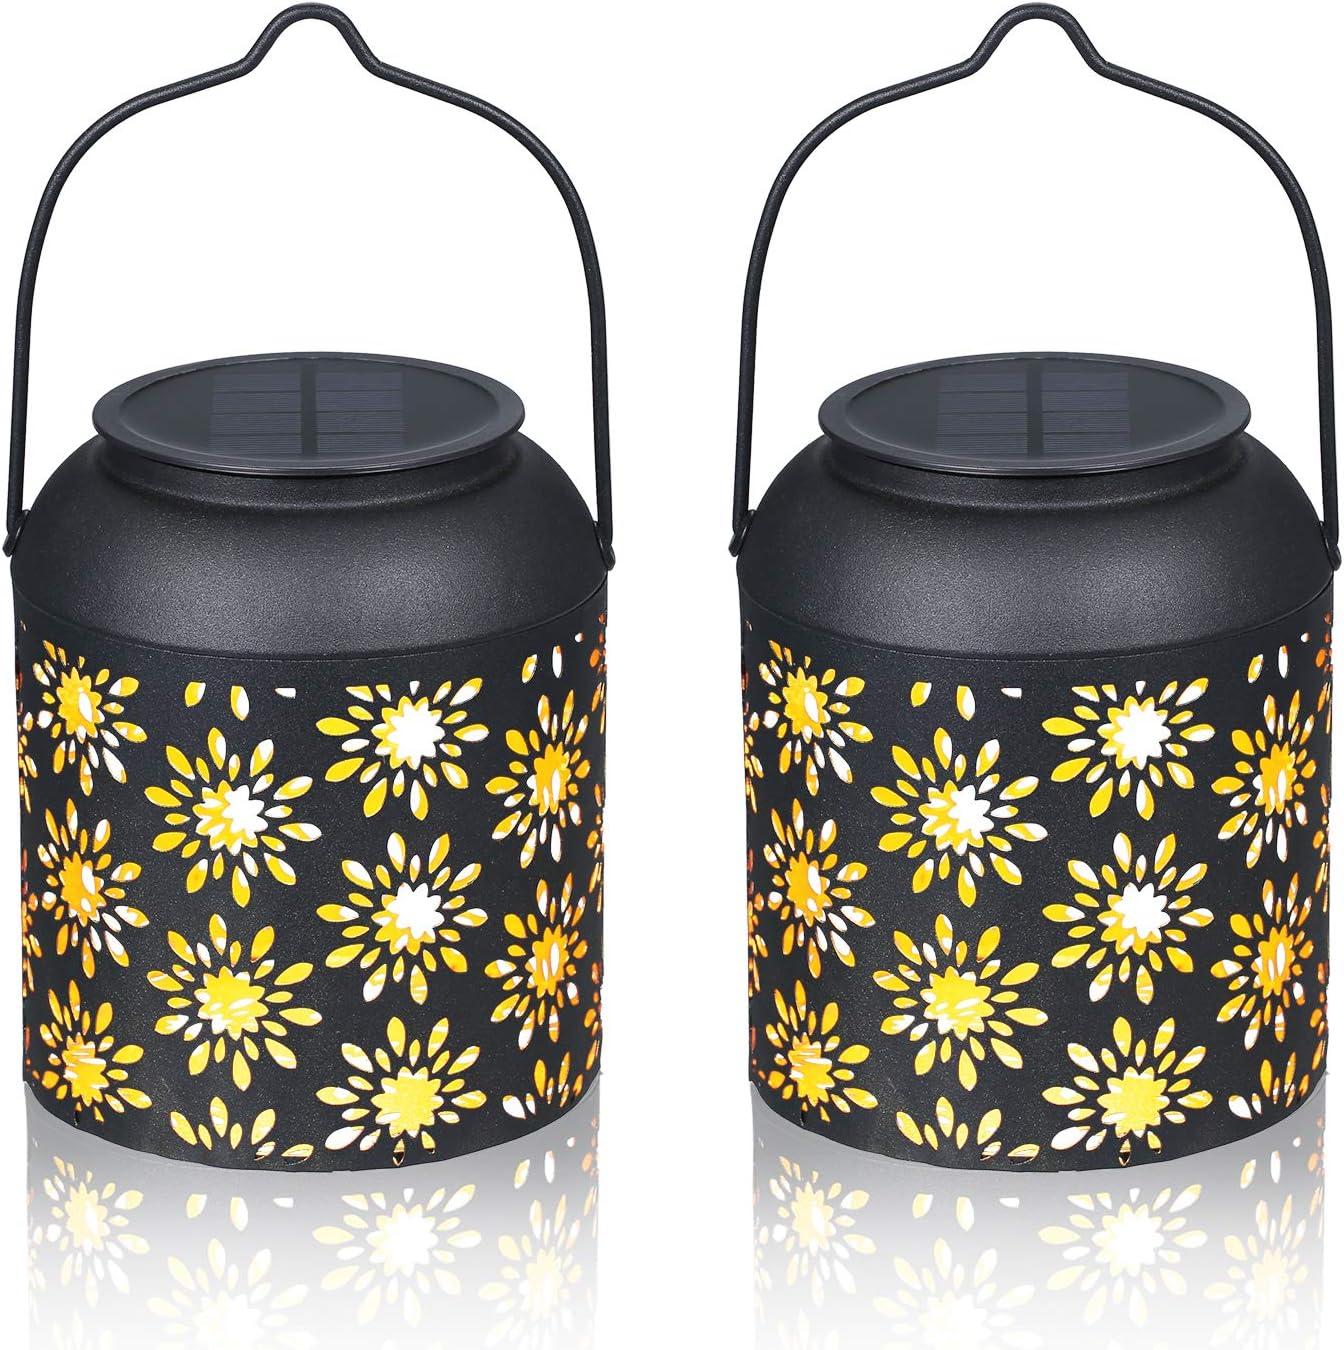 2 Pack Hanging Solar Lanterns, Tomshine Outdoor Lantern Warm White Waterproof Metal Patio Decor for Garden Landscape Yard Decoration (Flower Pattern)